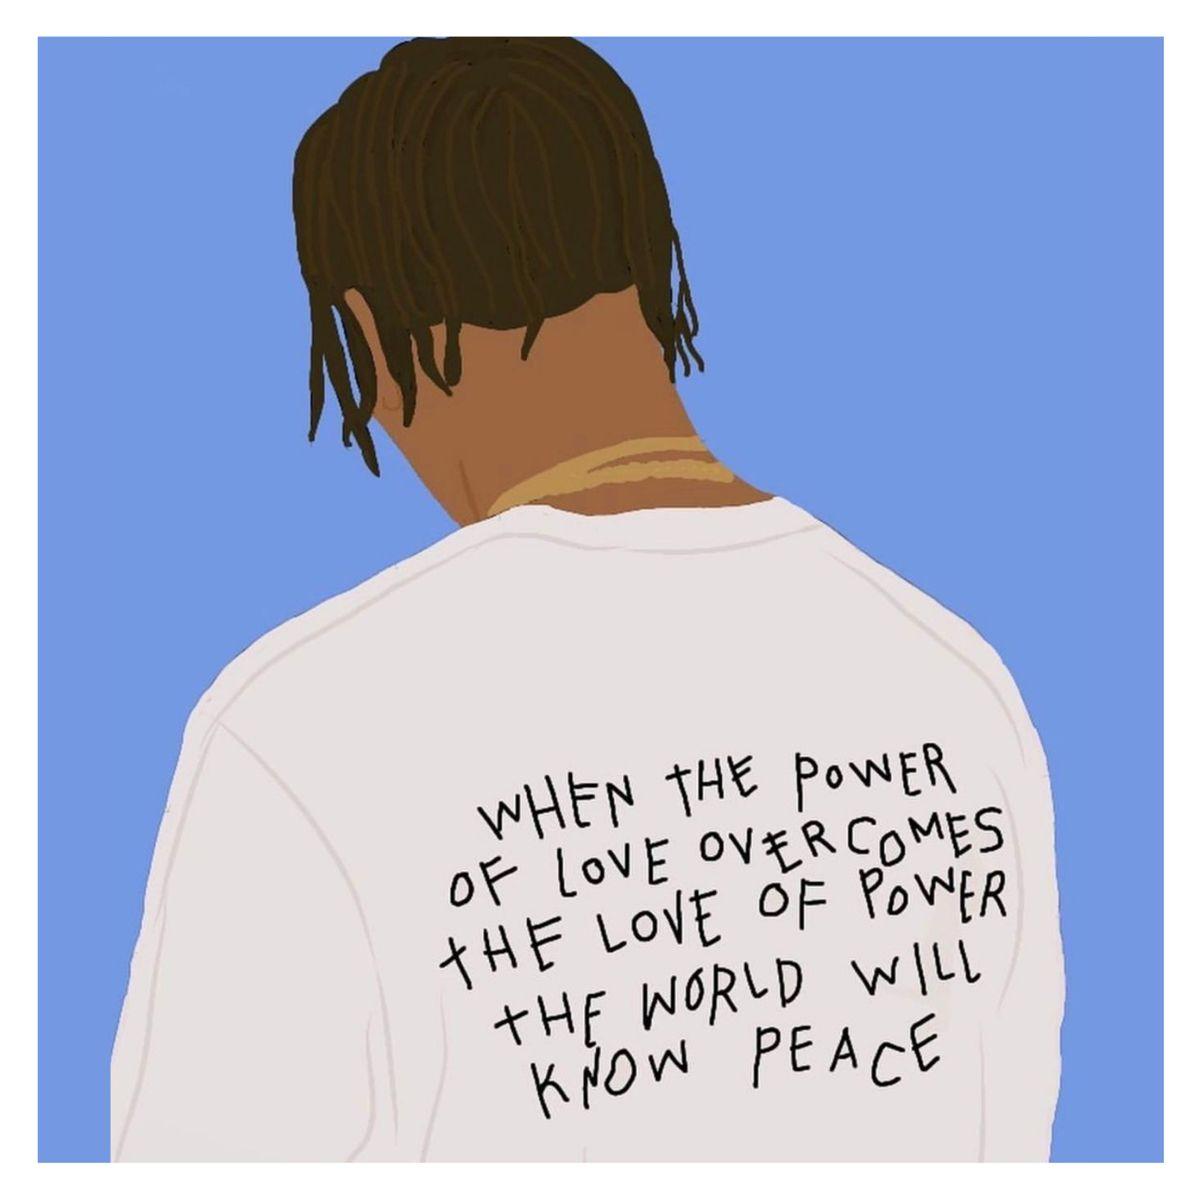 Art credit: @artbyshrreen_ on #instagram #artoninstagram #peace #peaceonearth #worldpeace #love #loveeveryone #truth #blog #bloggers #socialjustice